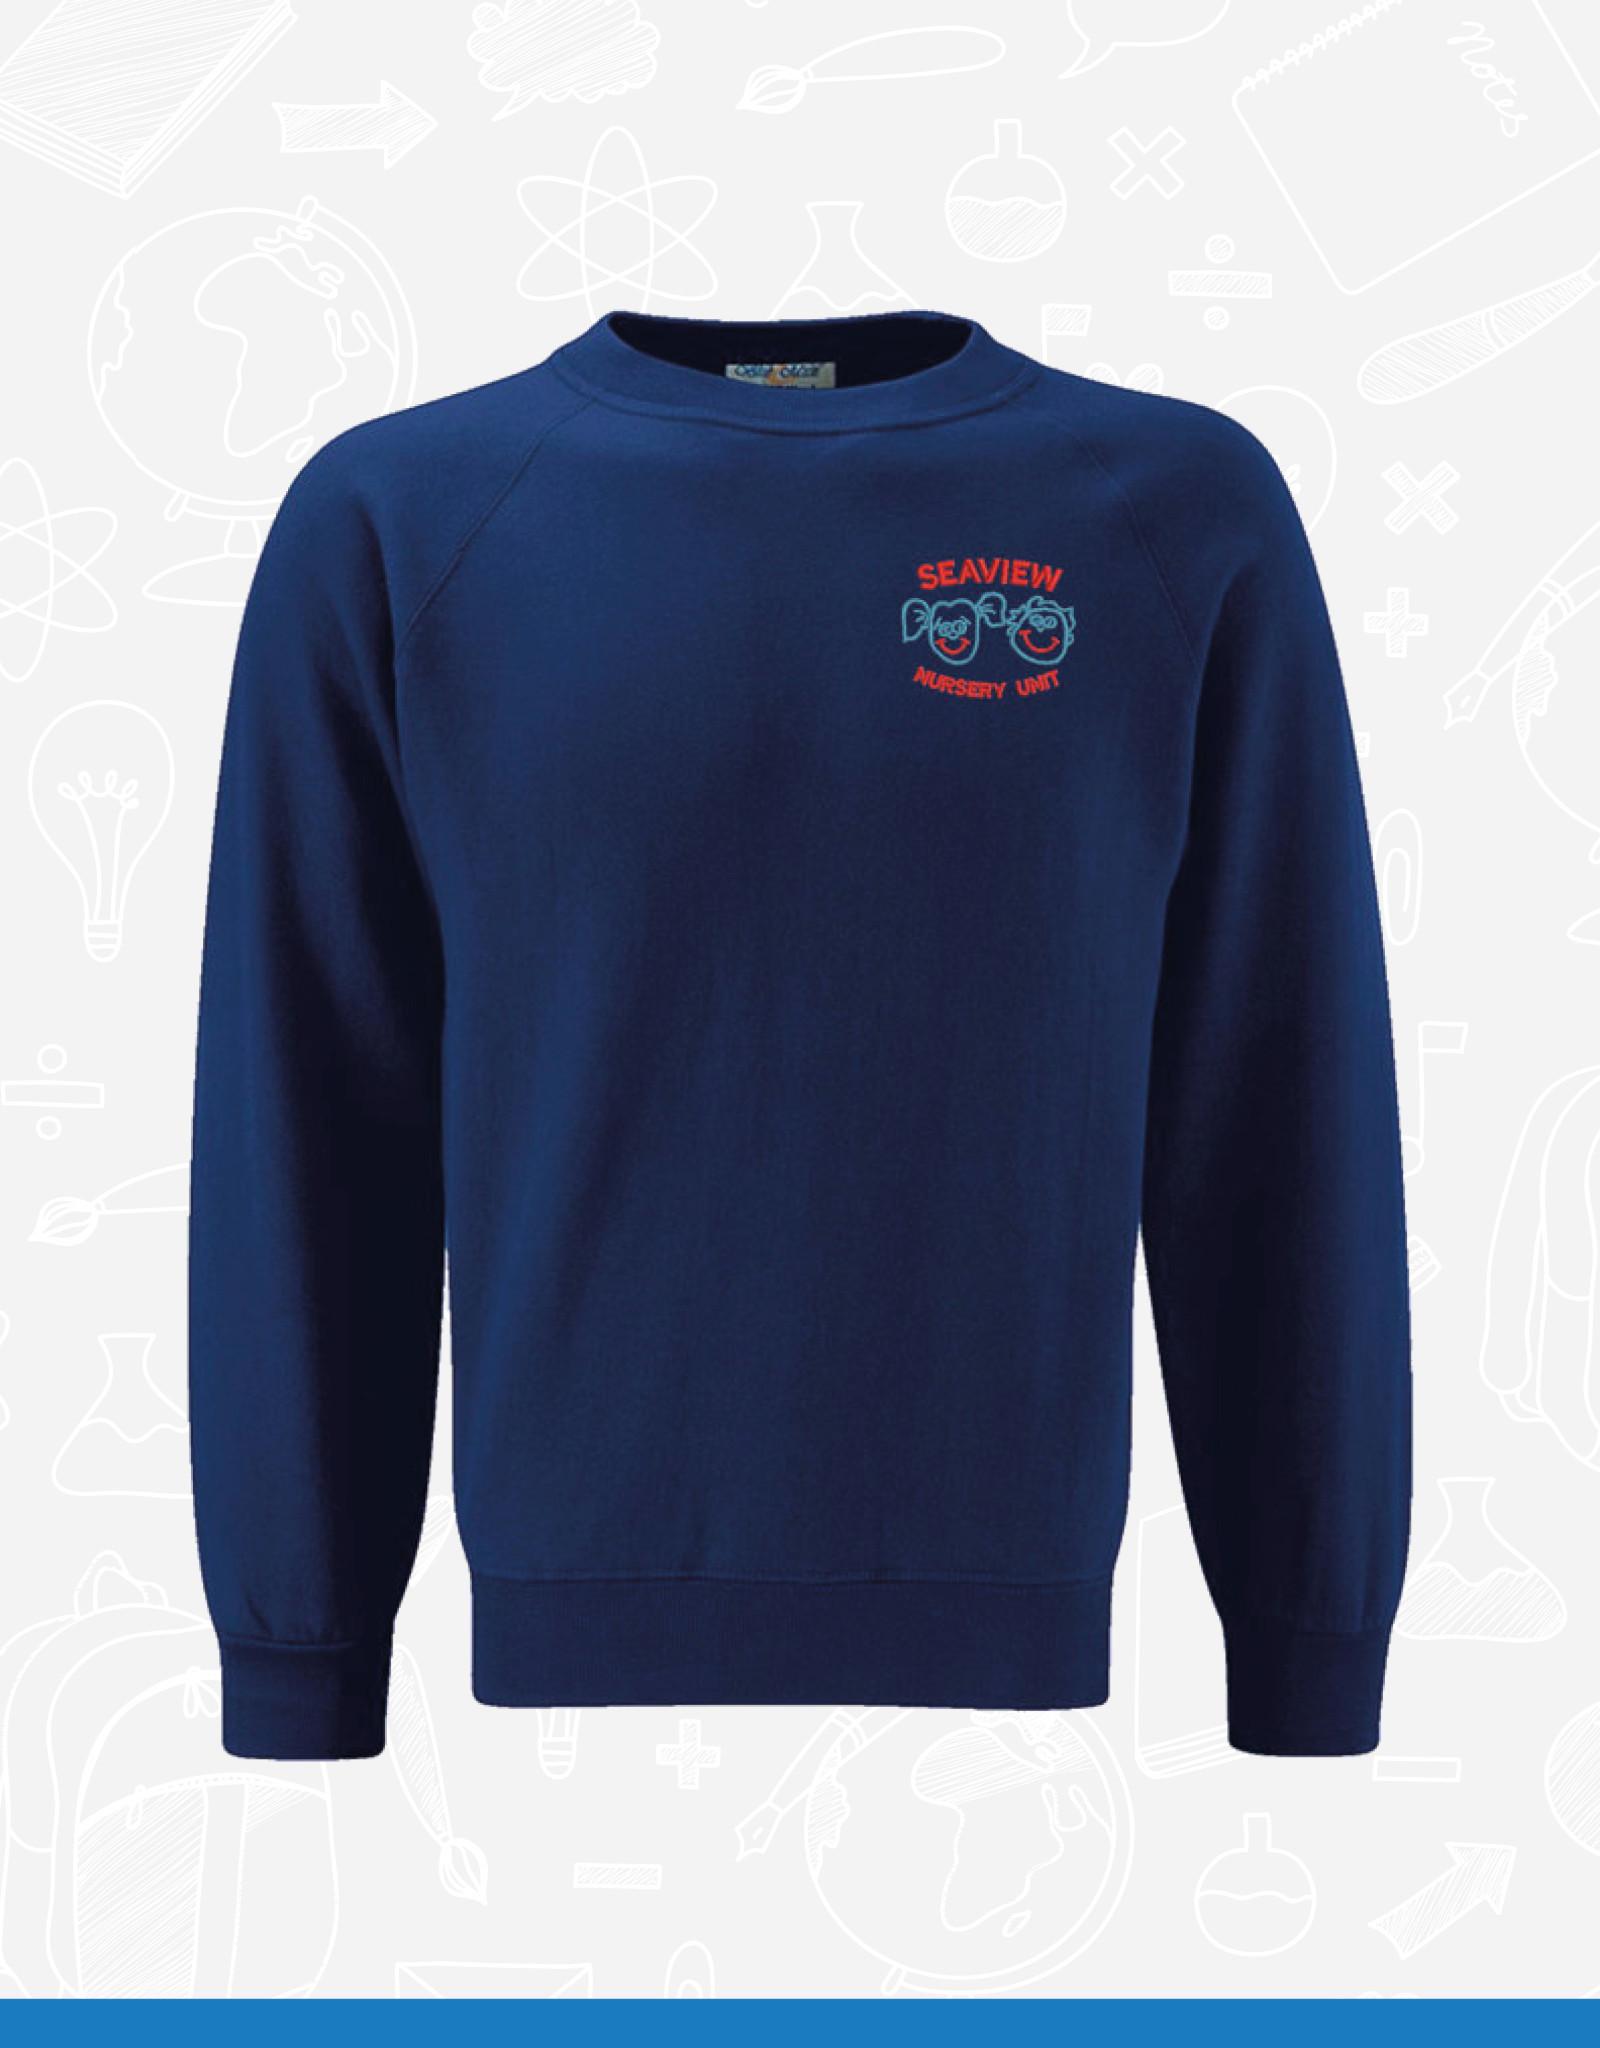 Banner Seaview Nursery Sweatshirt (3SR)